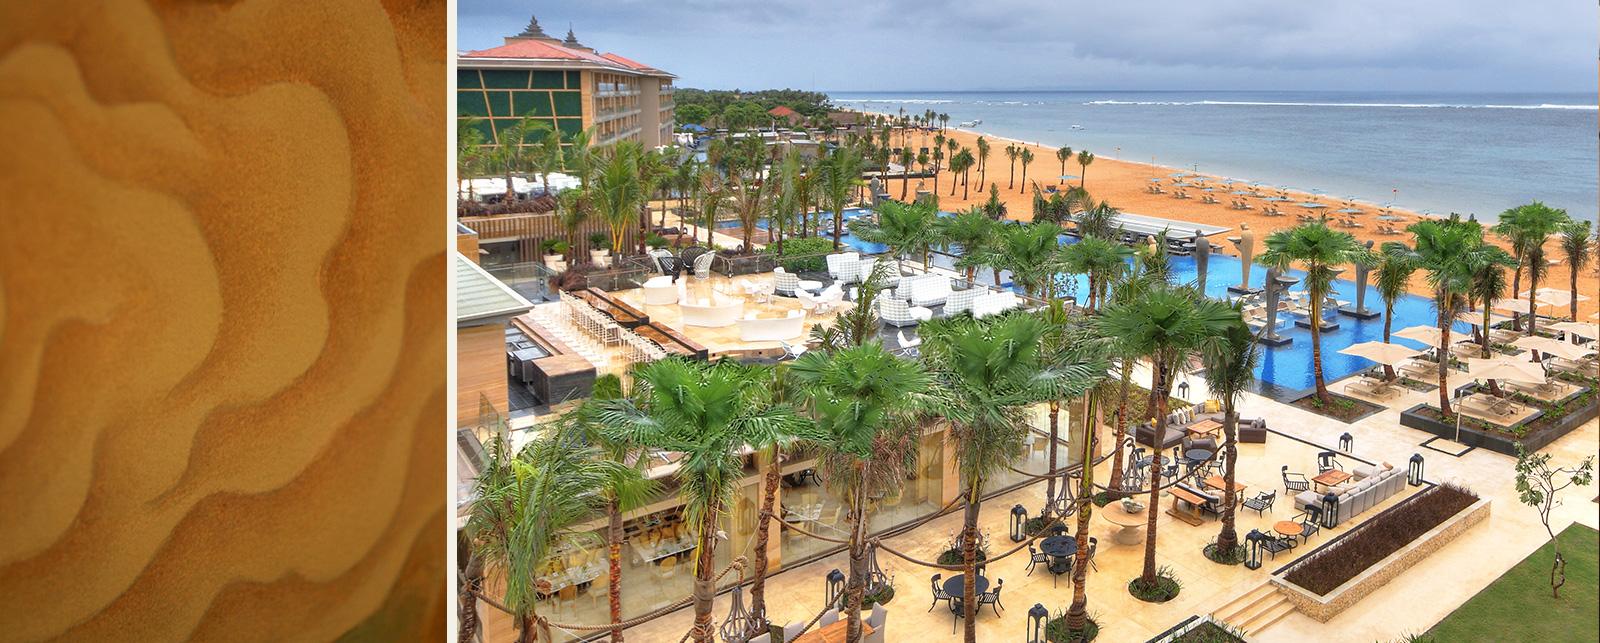 Luxury Resort In Nusa Dua The Mulia Nusa Dua Bali